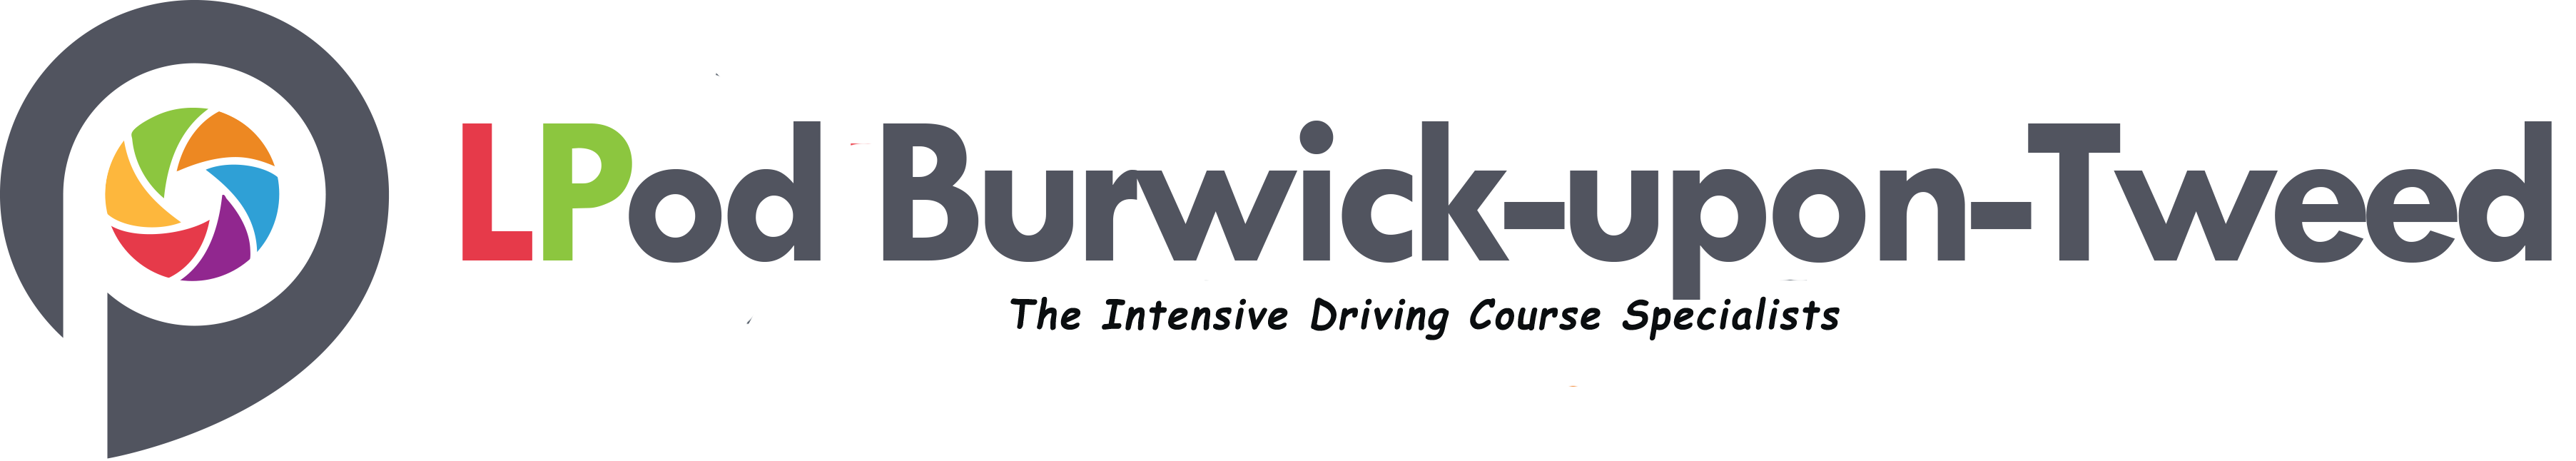 intensive driving courses in Berwick-upon-Tweed